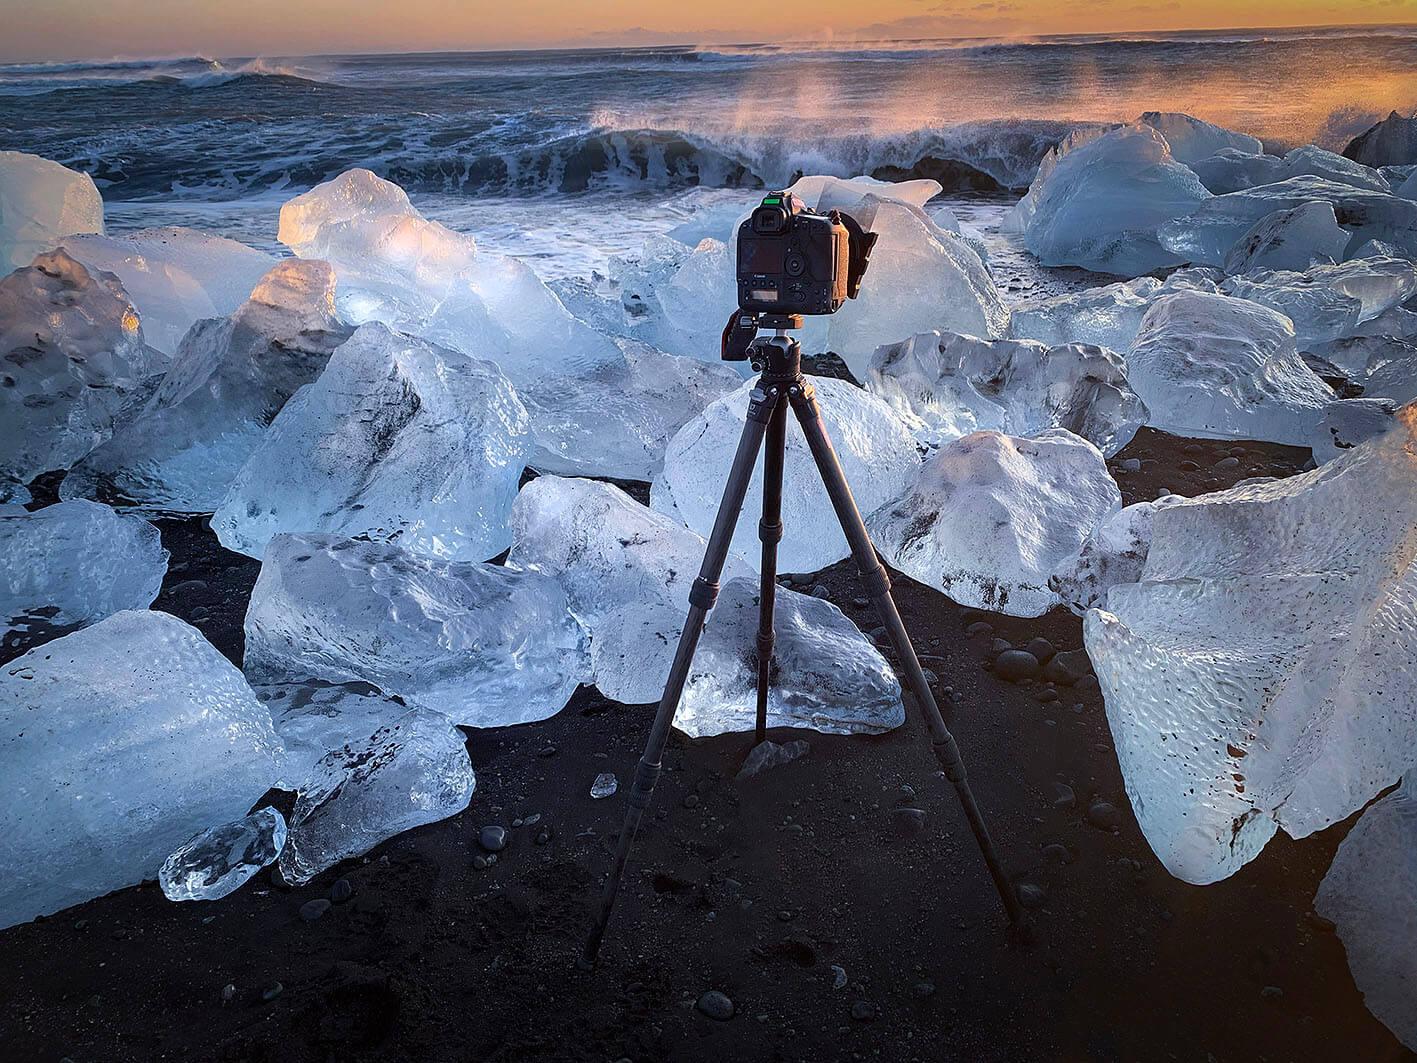 Entrevista al fotógrafo Miguel Angel Morenatti probando Leofoto